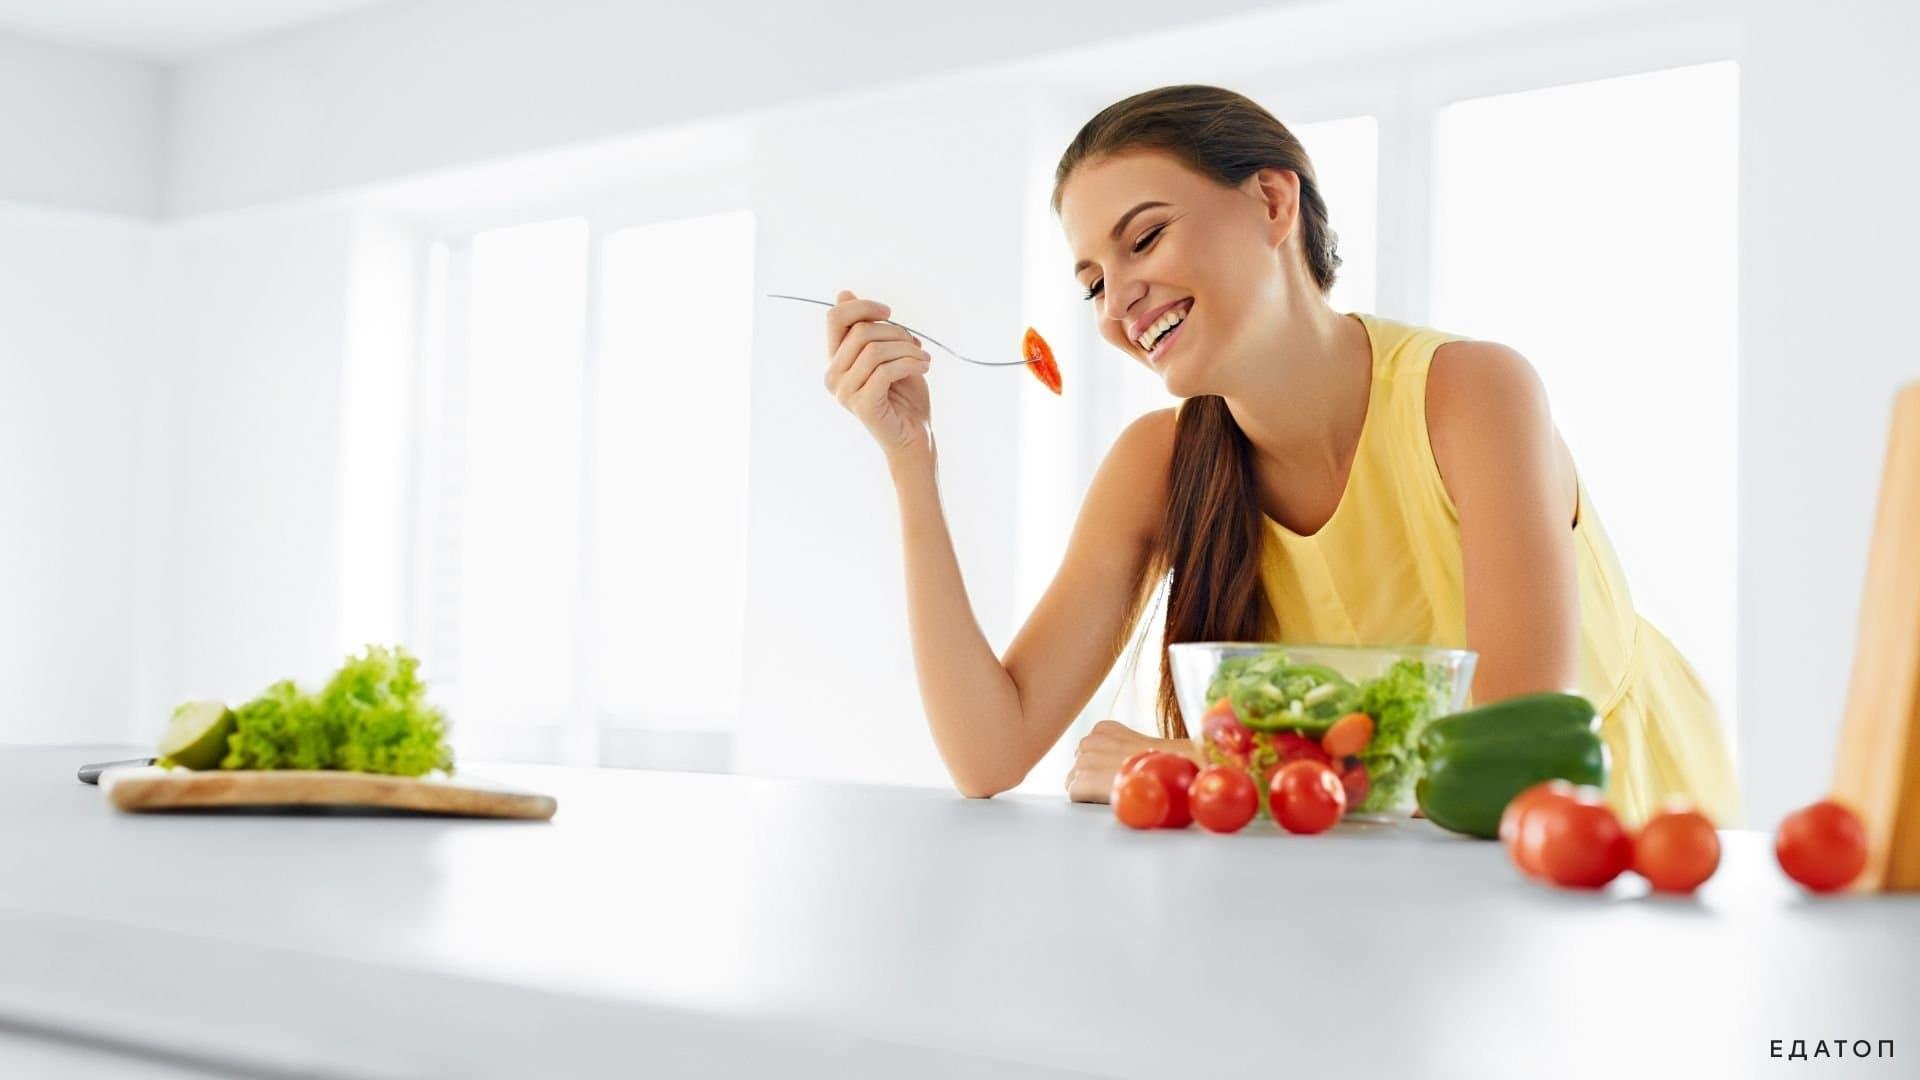 Избавляемся от лишнего веса при помощи диет.